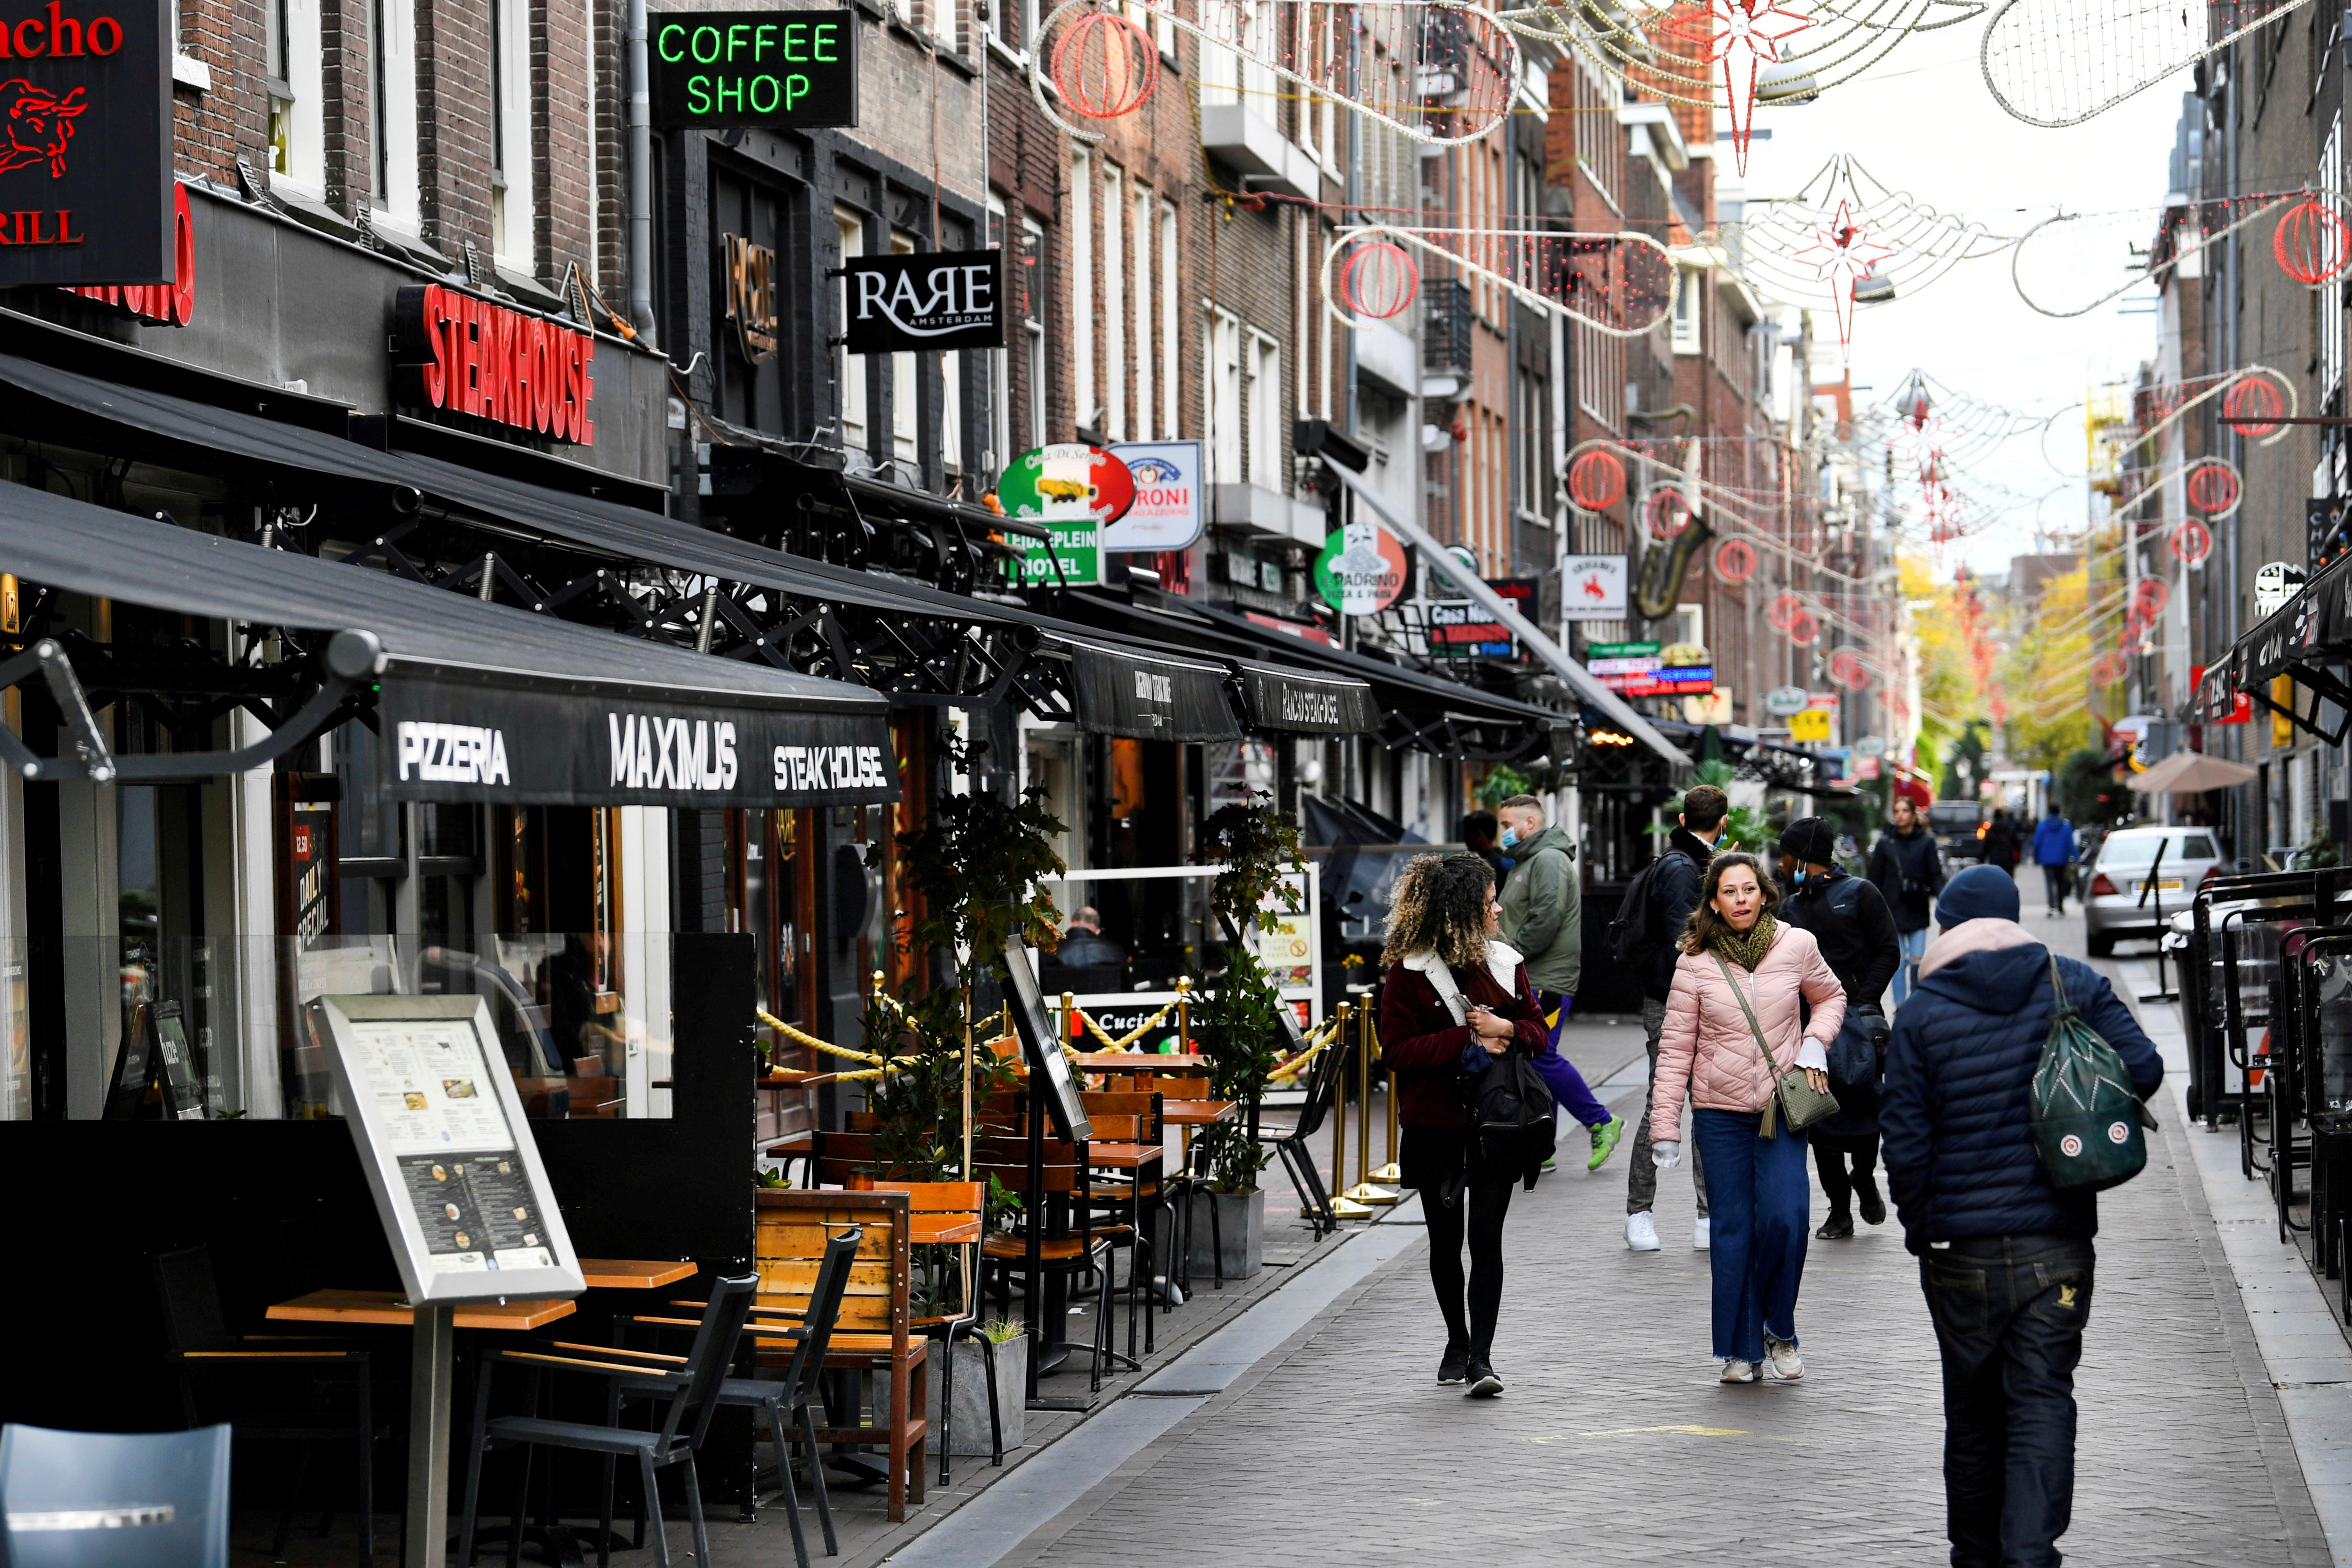 People walk past restaurants and bars as the Netherlands battles to control the spread of the coronavirus disease (COVID-19), in Amsterdam, Netherlands October 14 2020. REUTERS/Piroschka van de Wouw